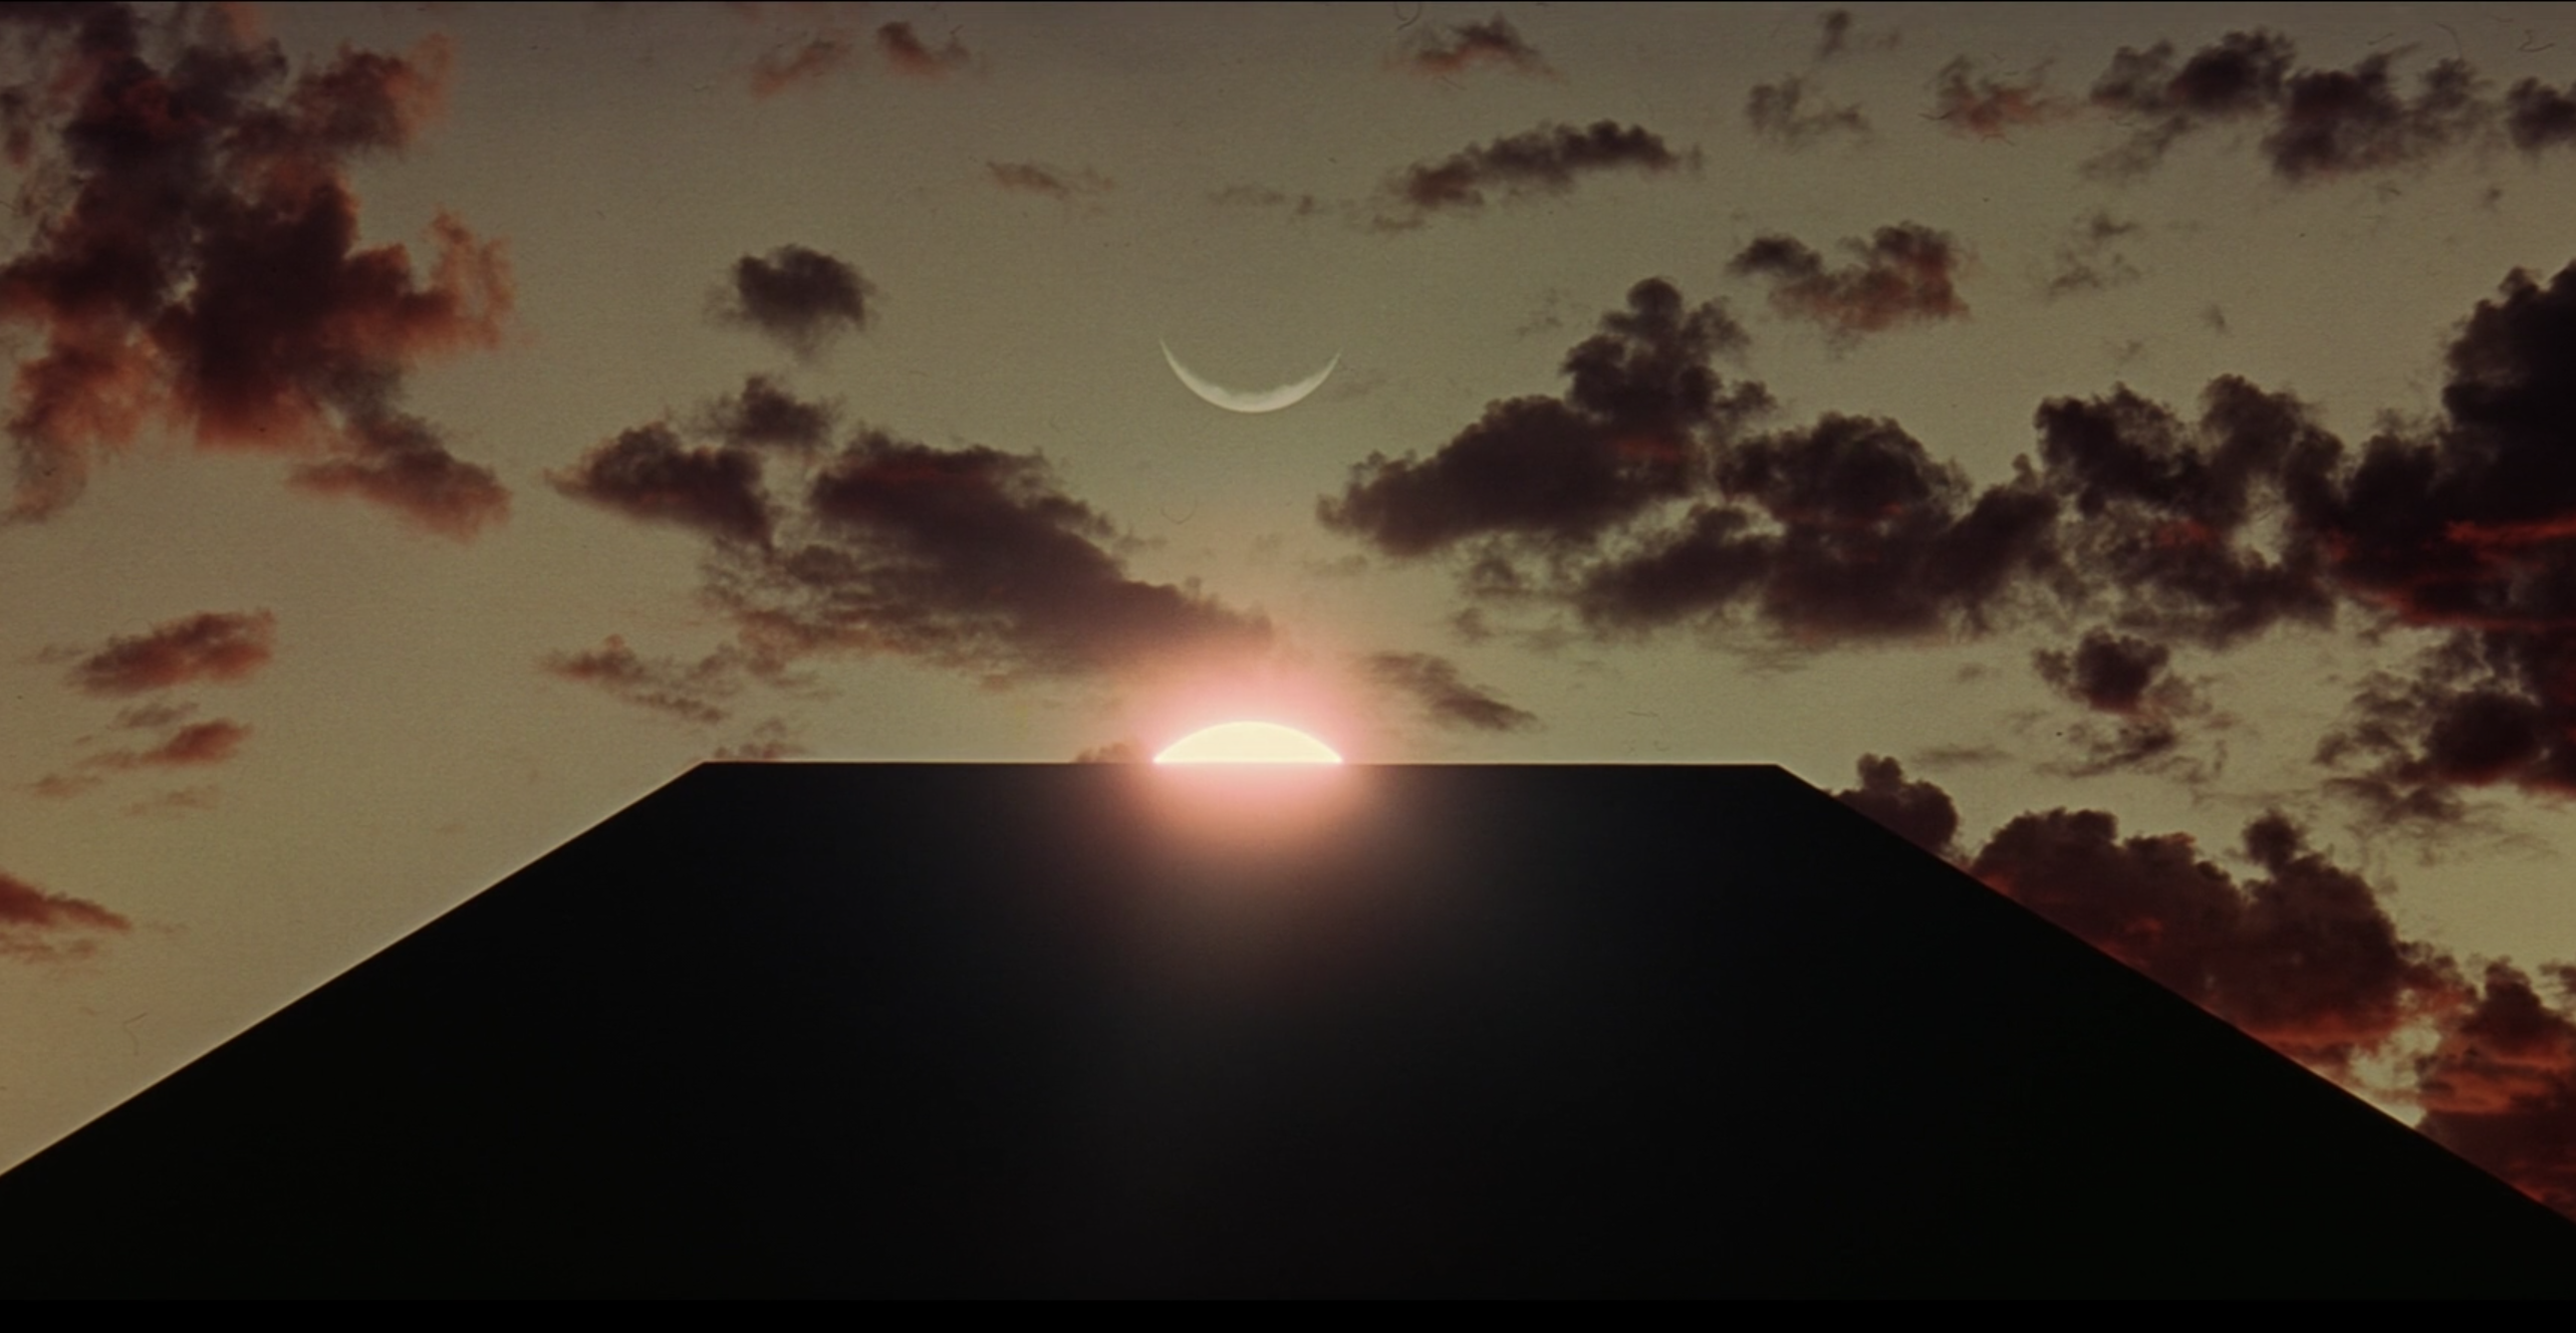 Kubrick - Monolith - 2001 Space Odyssey